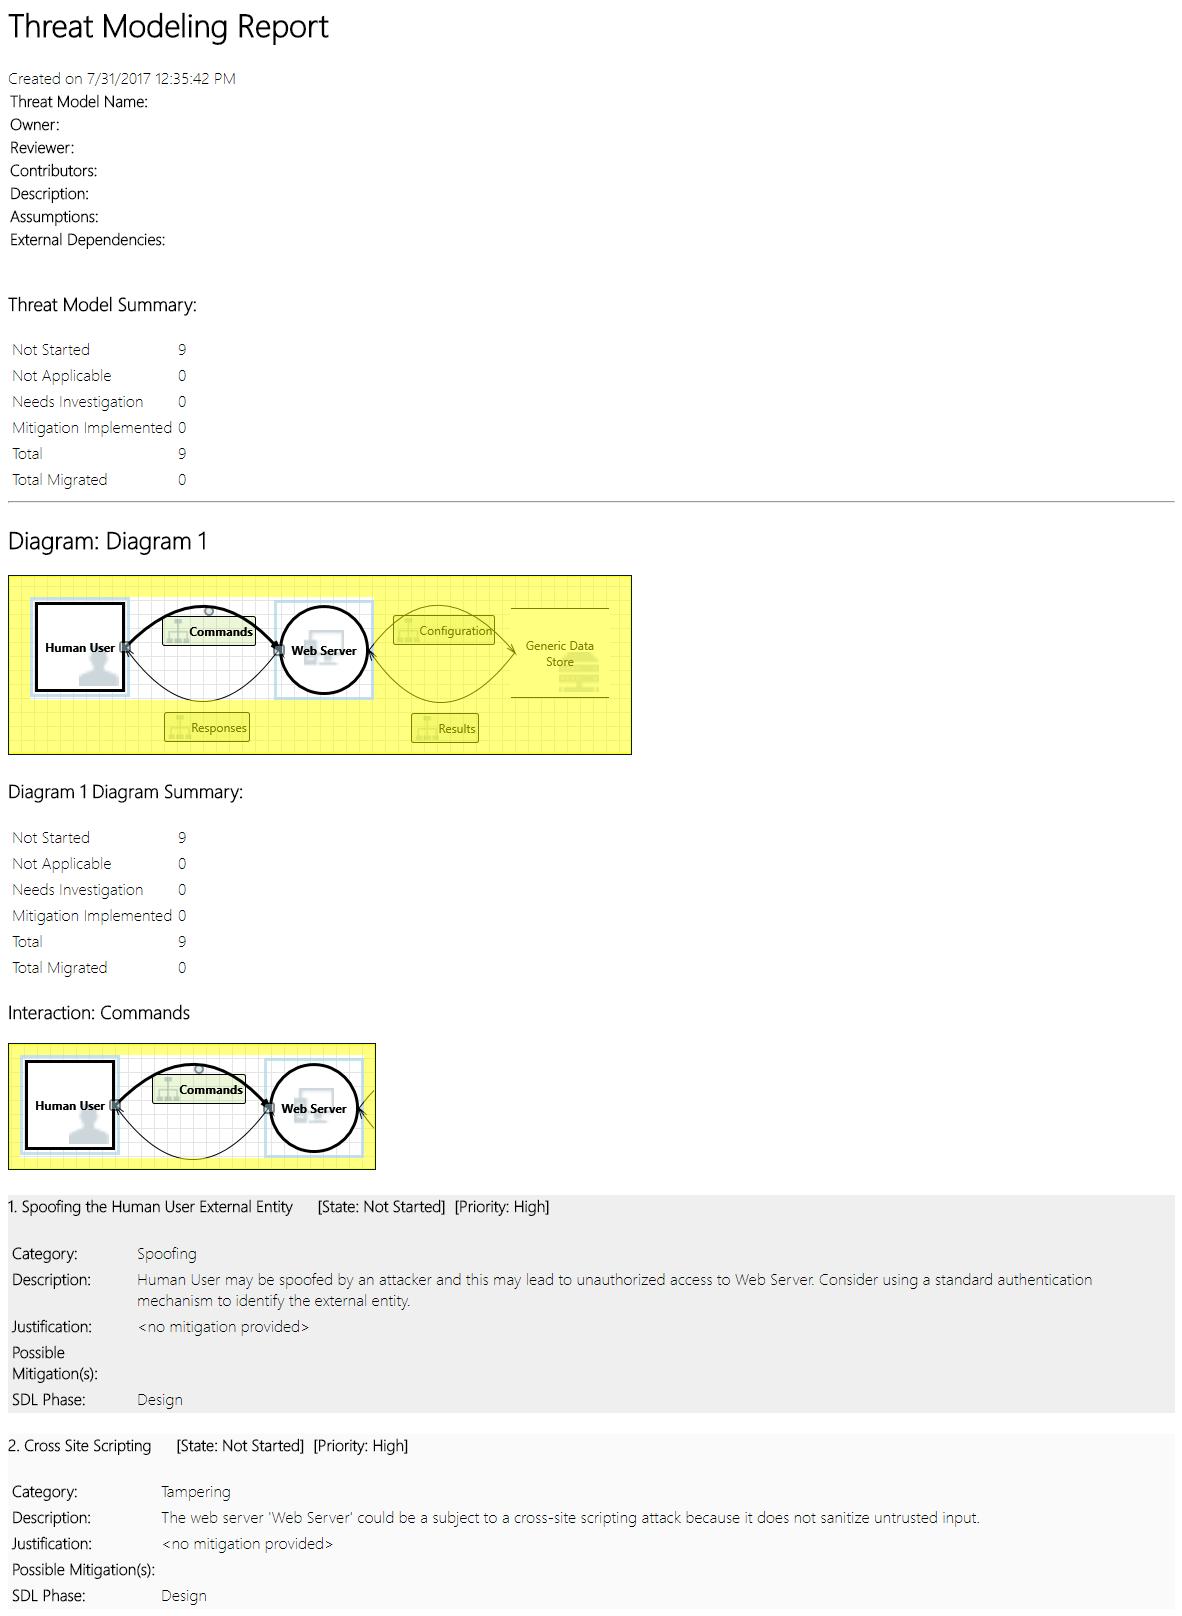 Getting Started Microsoft Threat Modeling Tool Azure Microsoft